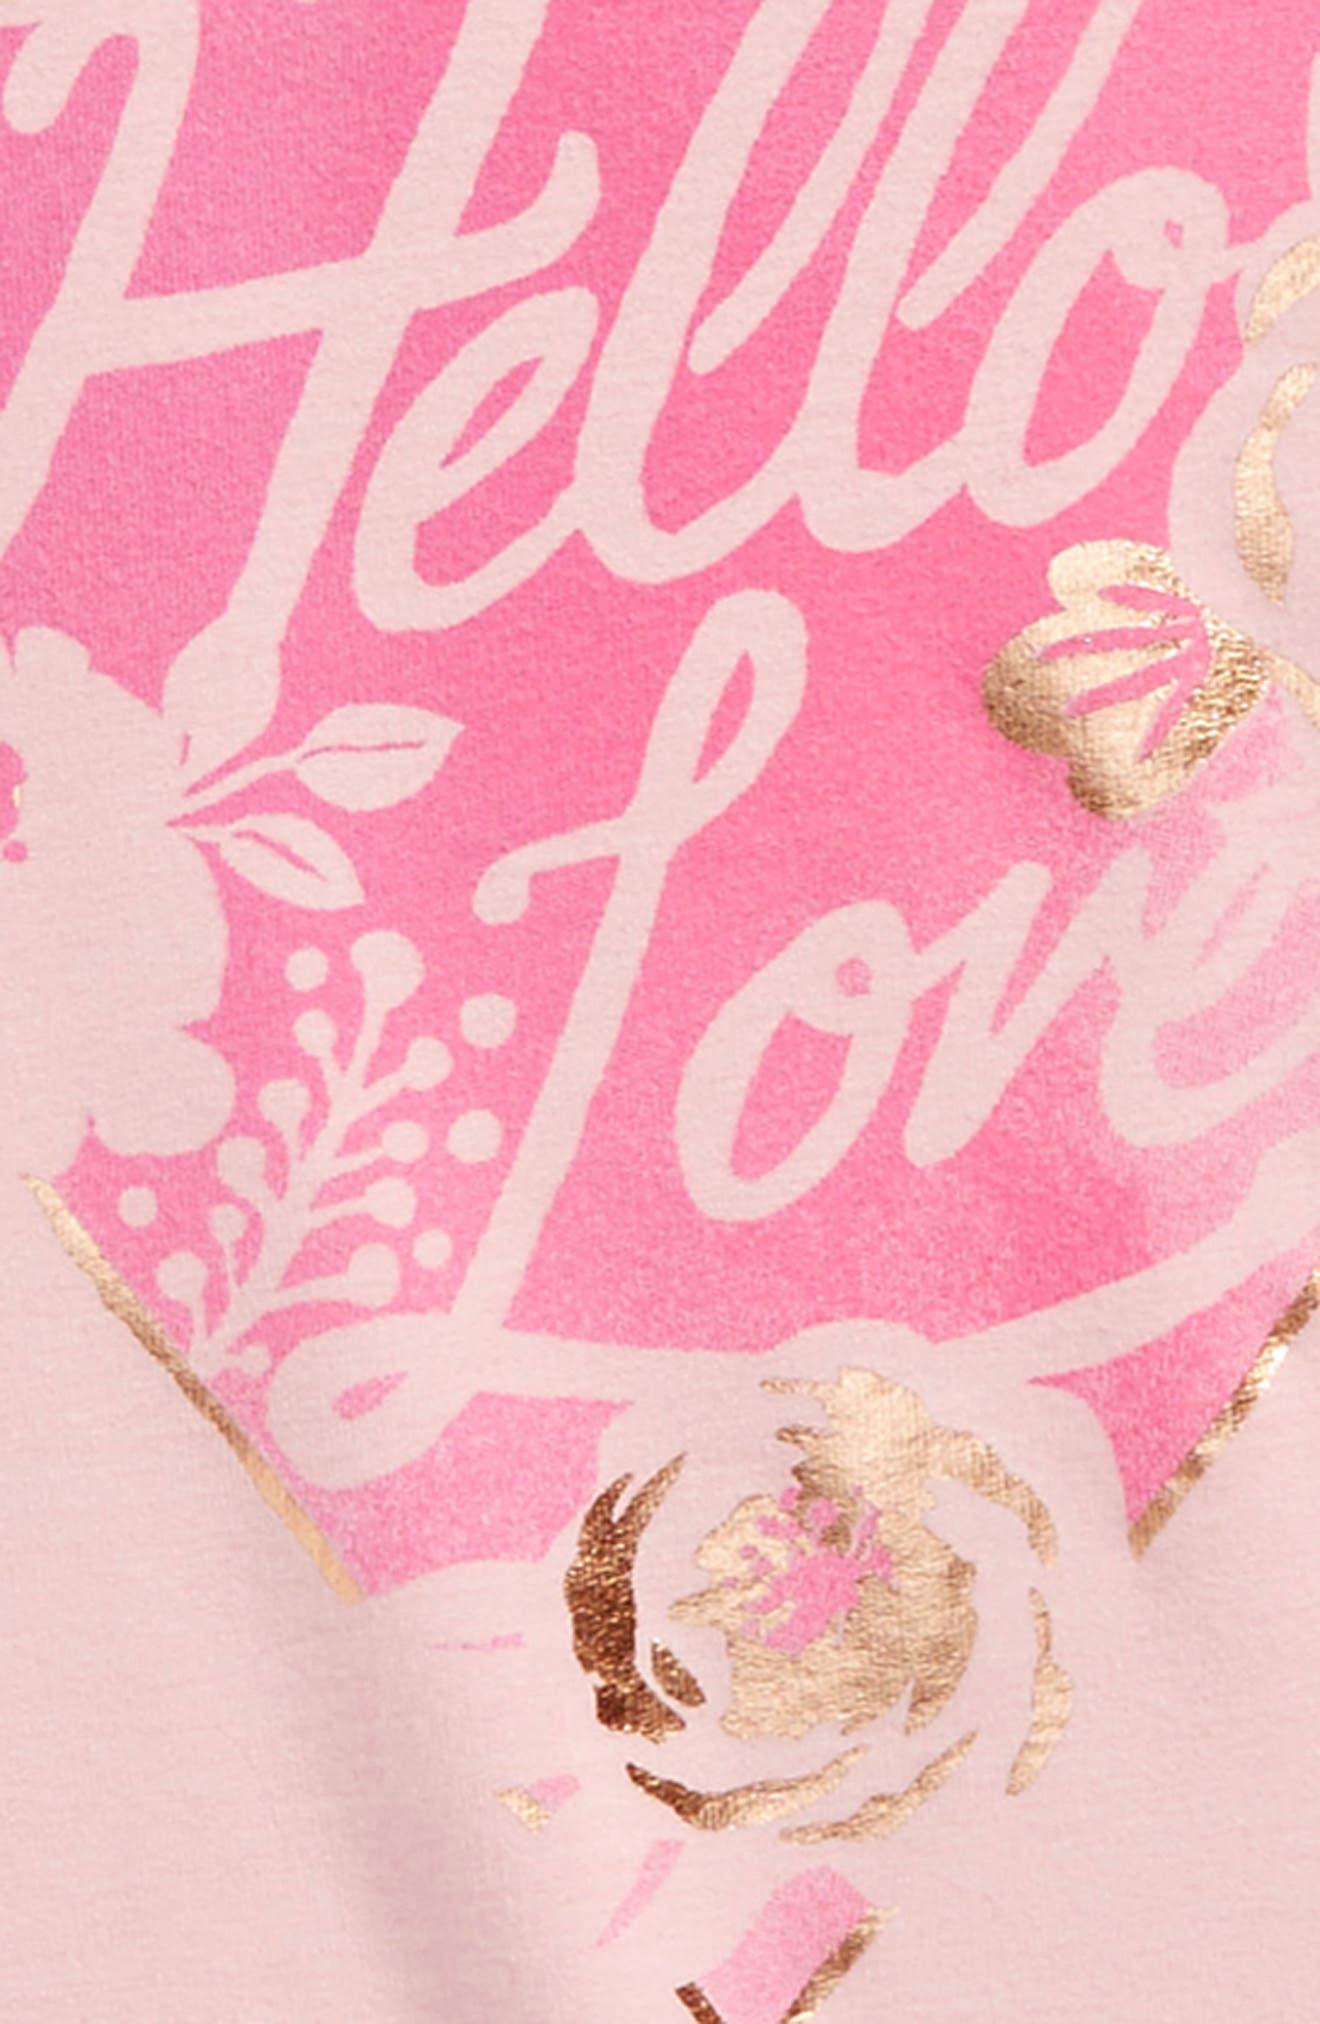 Peek Hello Love Graphic Tee,                             Alternate thumbnail 2, color,                             650